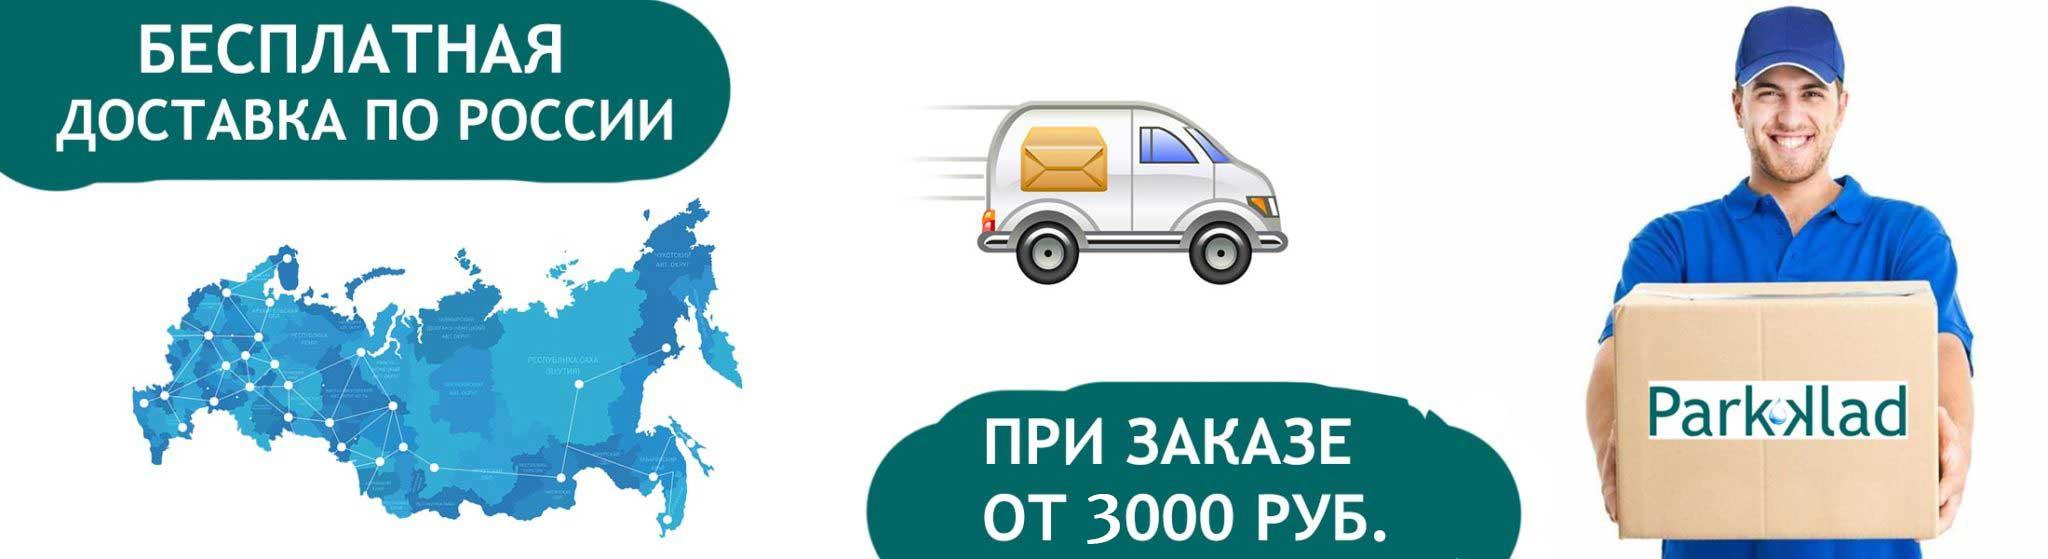 Условия доставки по России